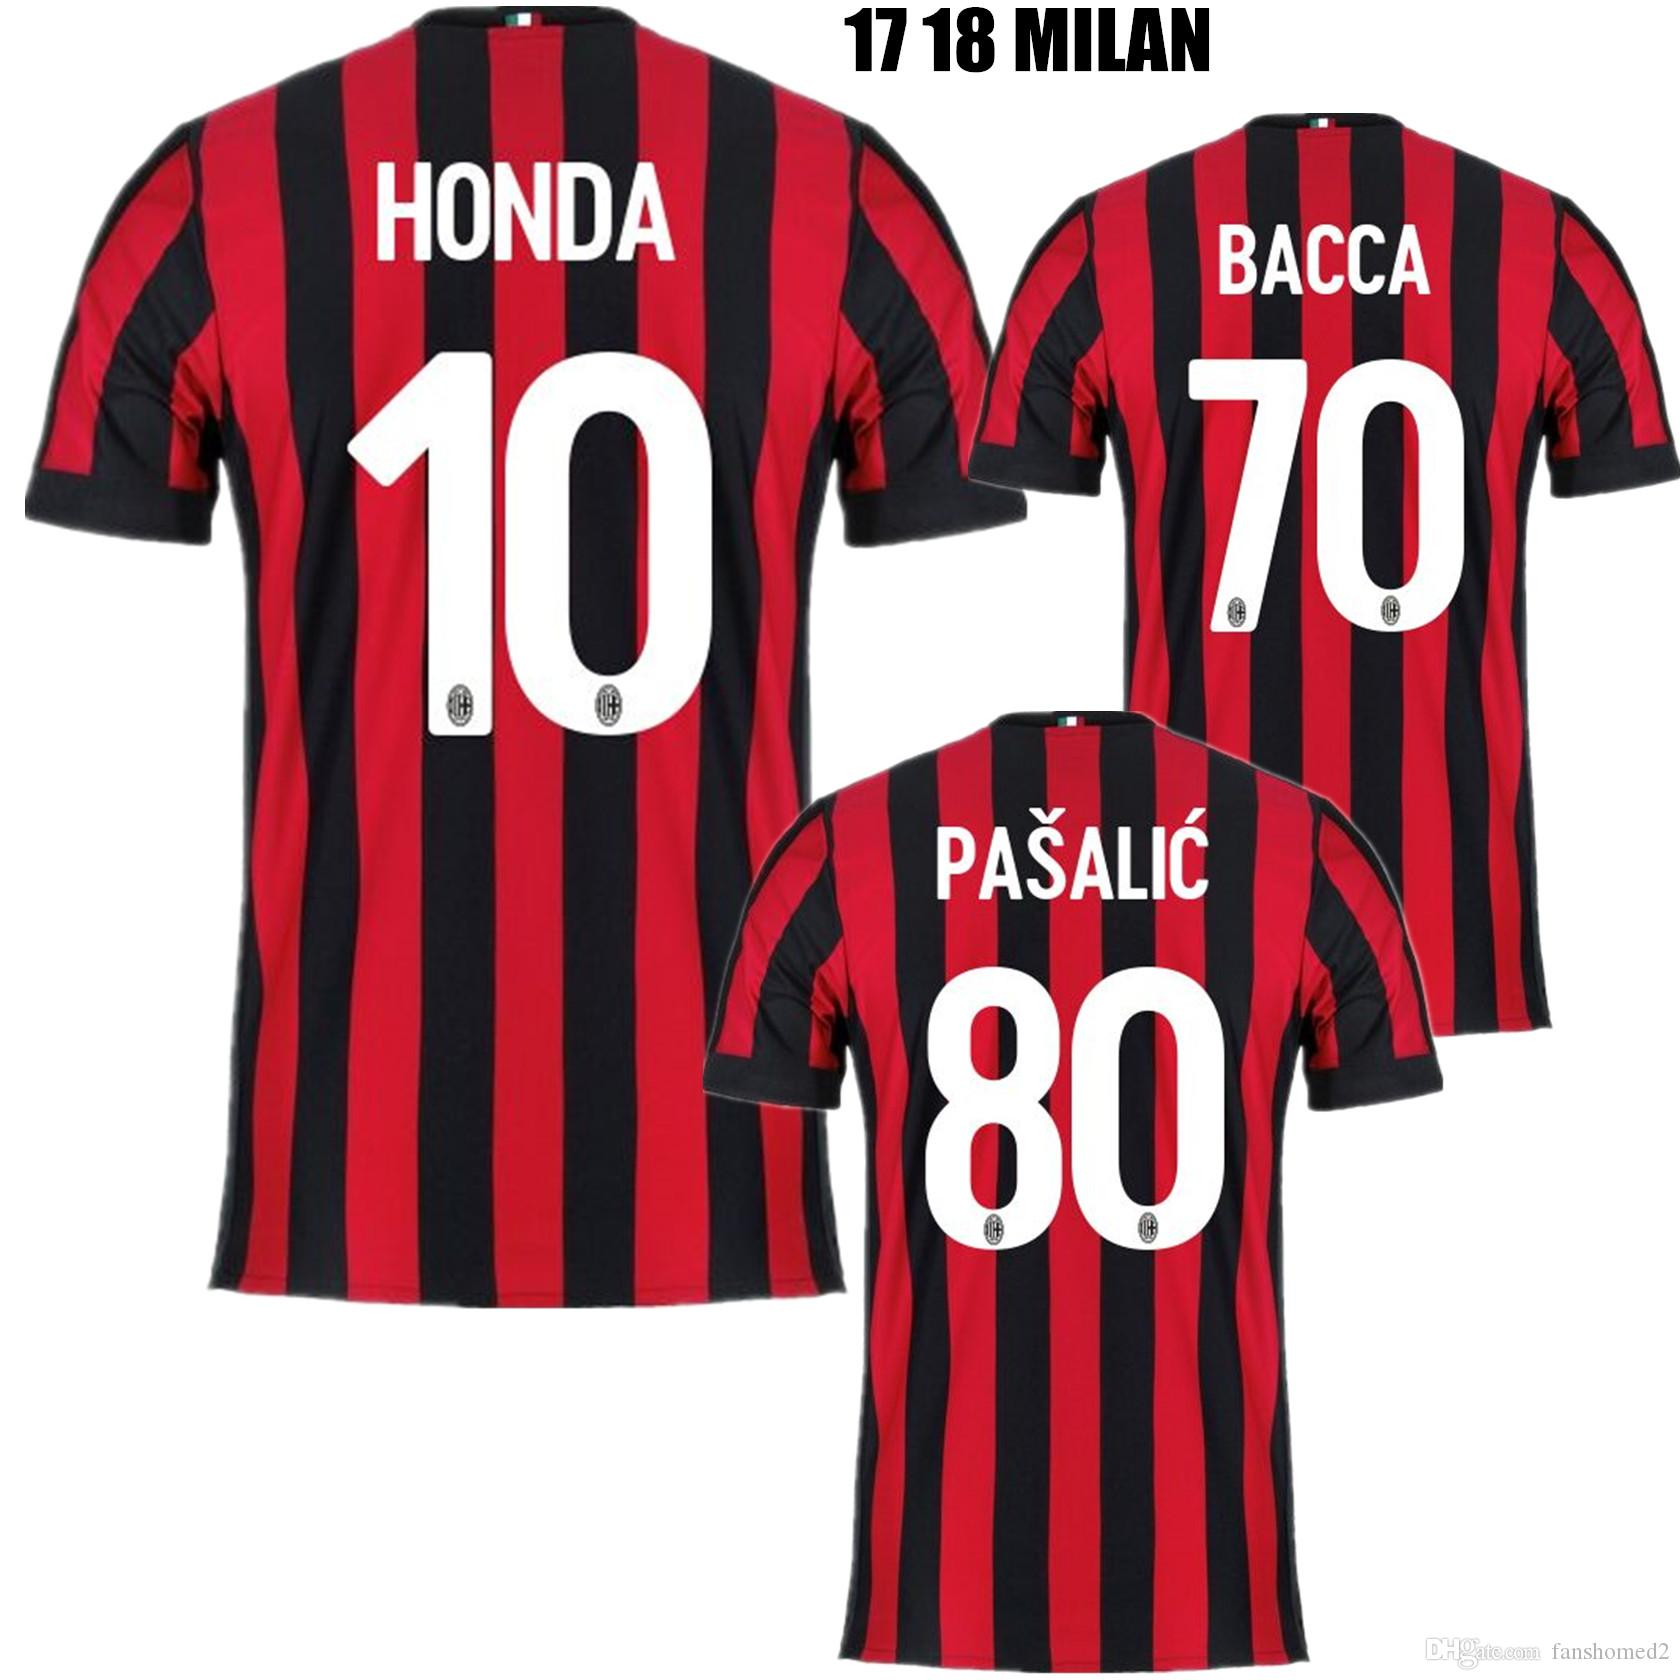 Maillot Extérieur AC Milan acheter